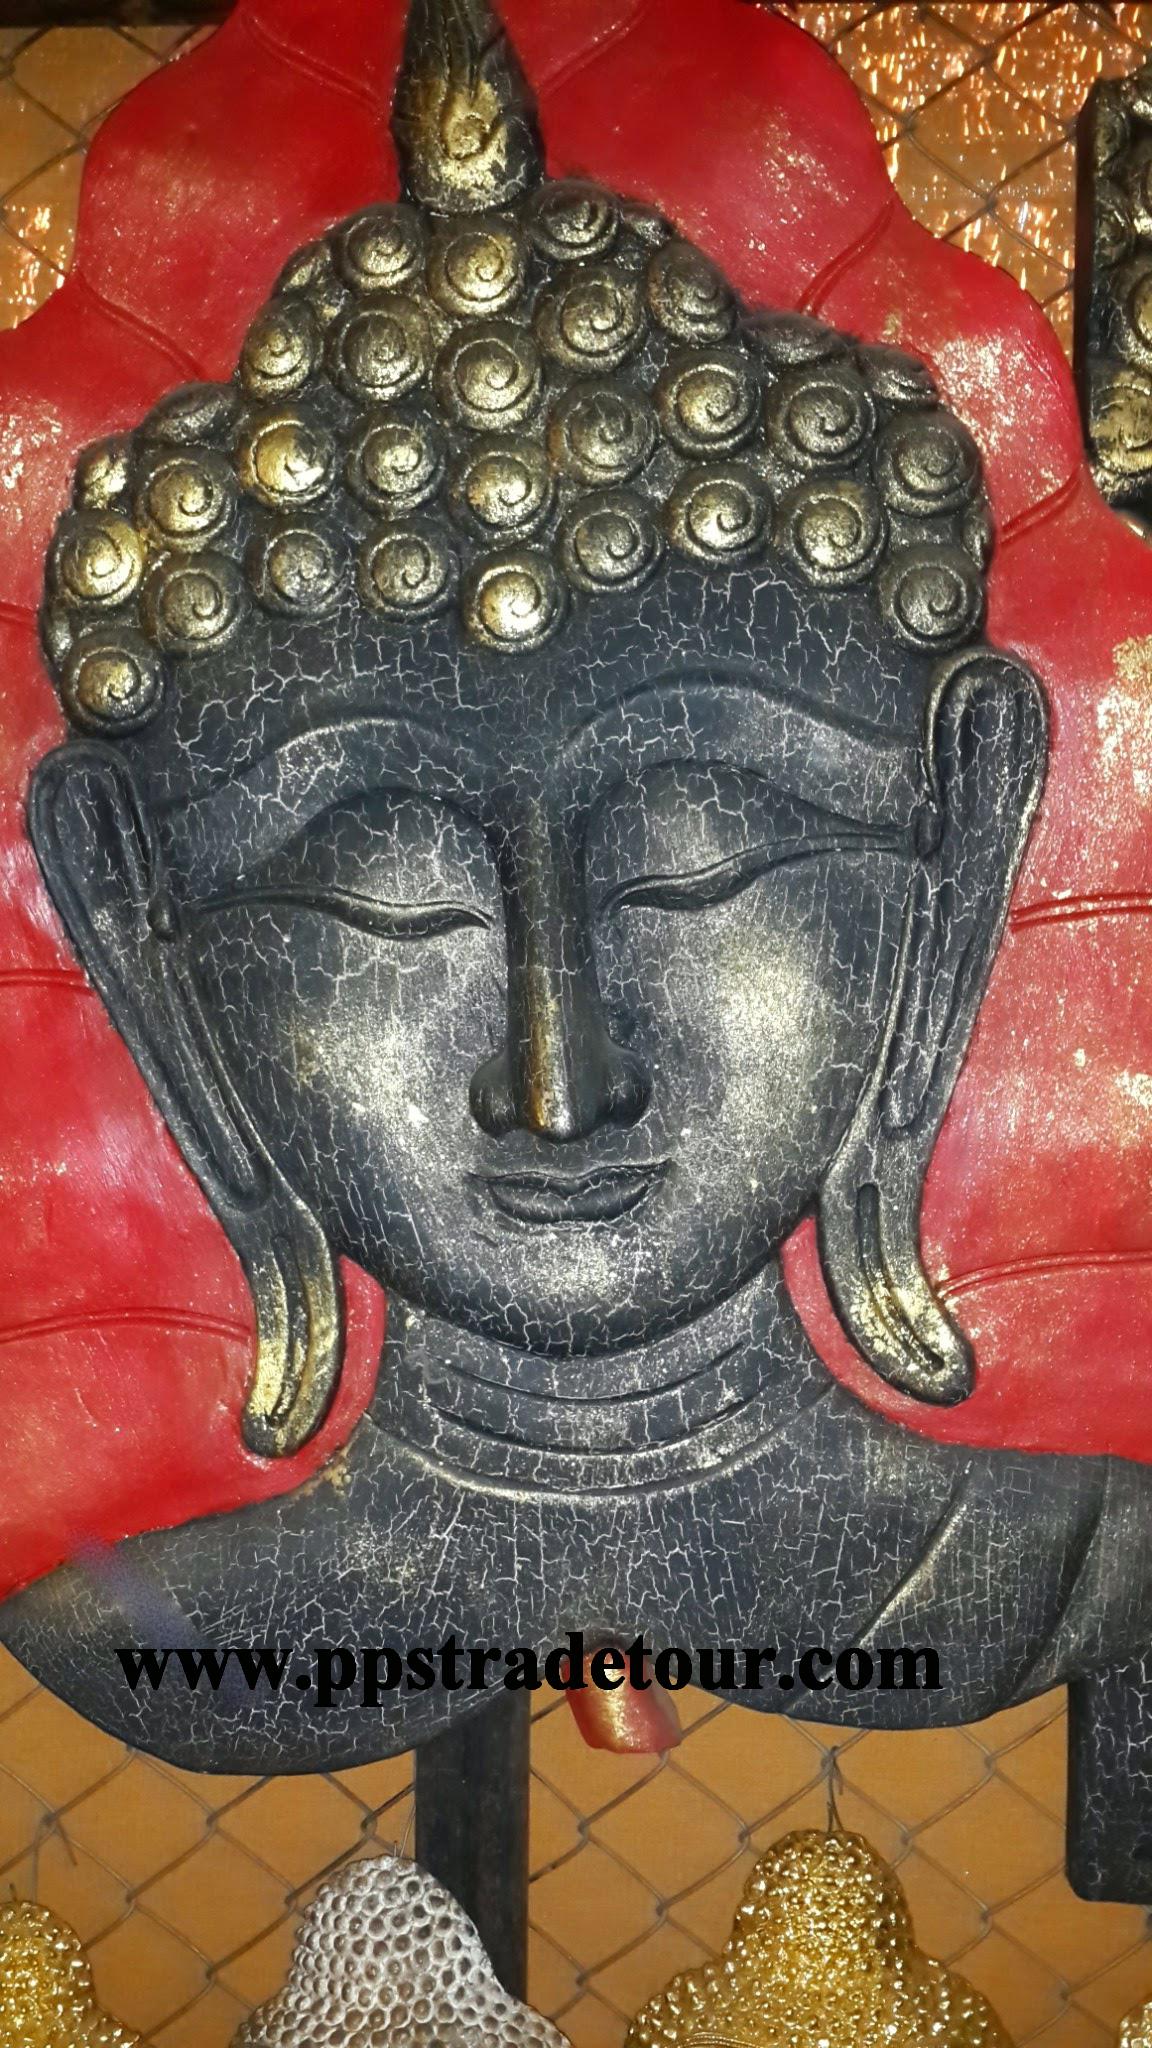 BuddhaFaceCarved3